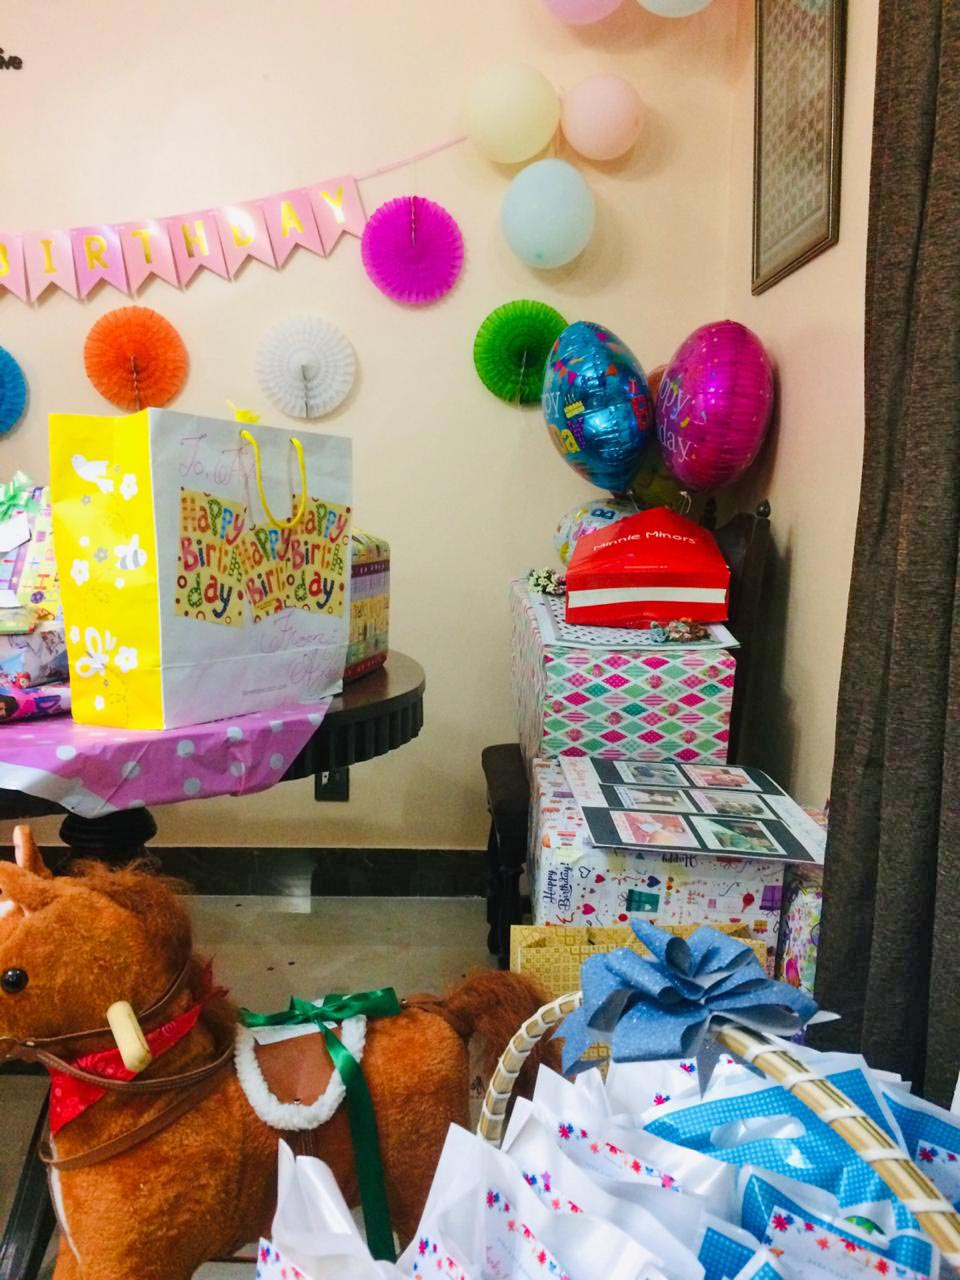 Ayra got a lot of gifts, Masha'Allah!